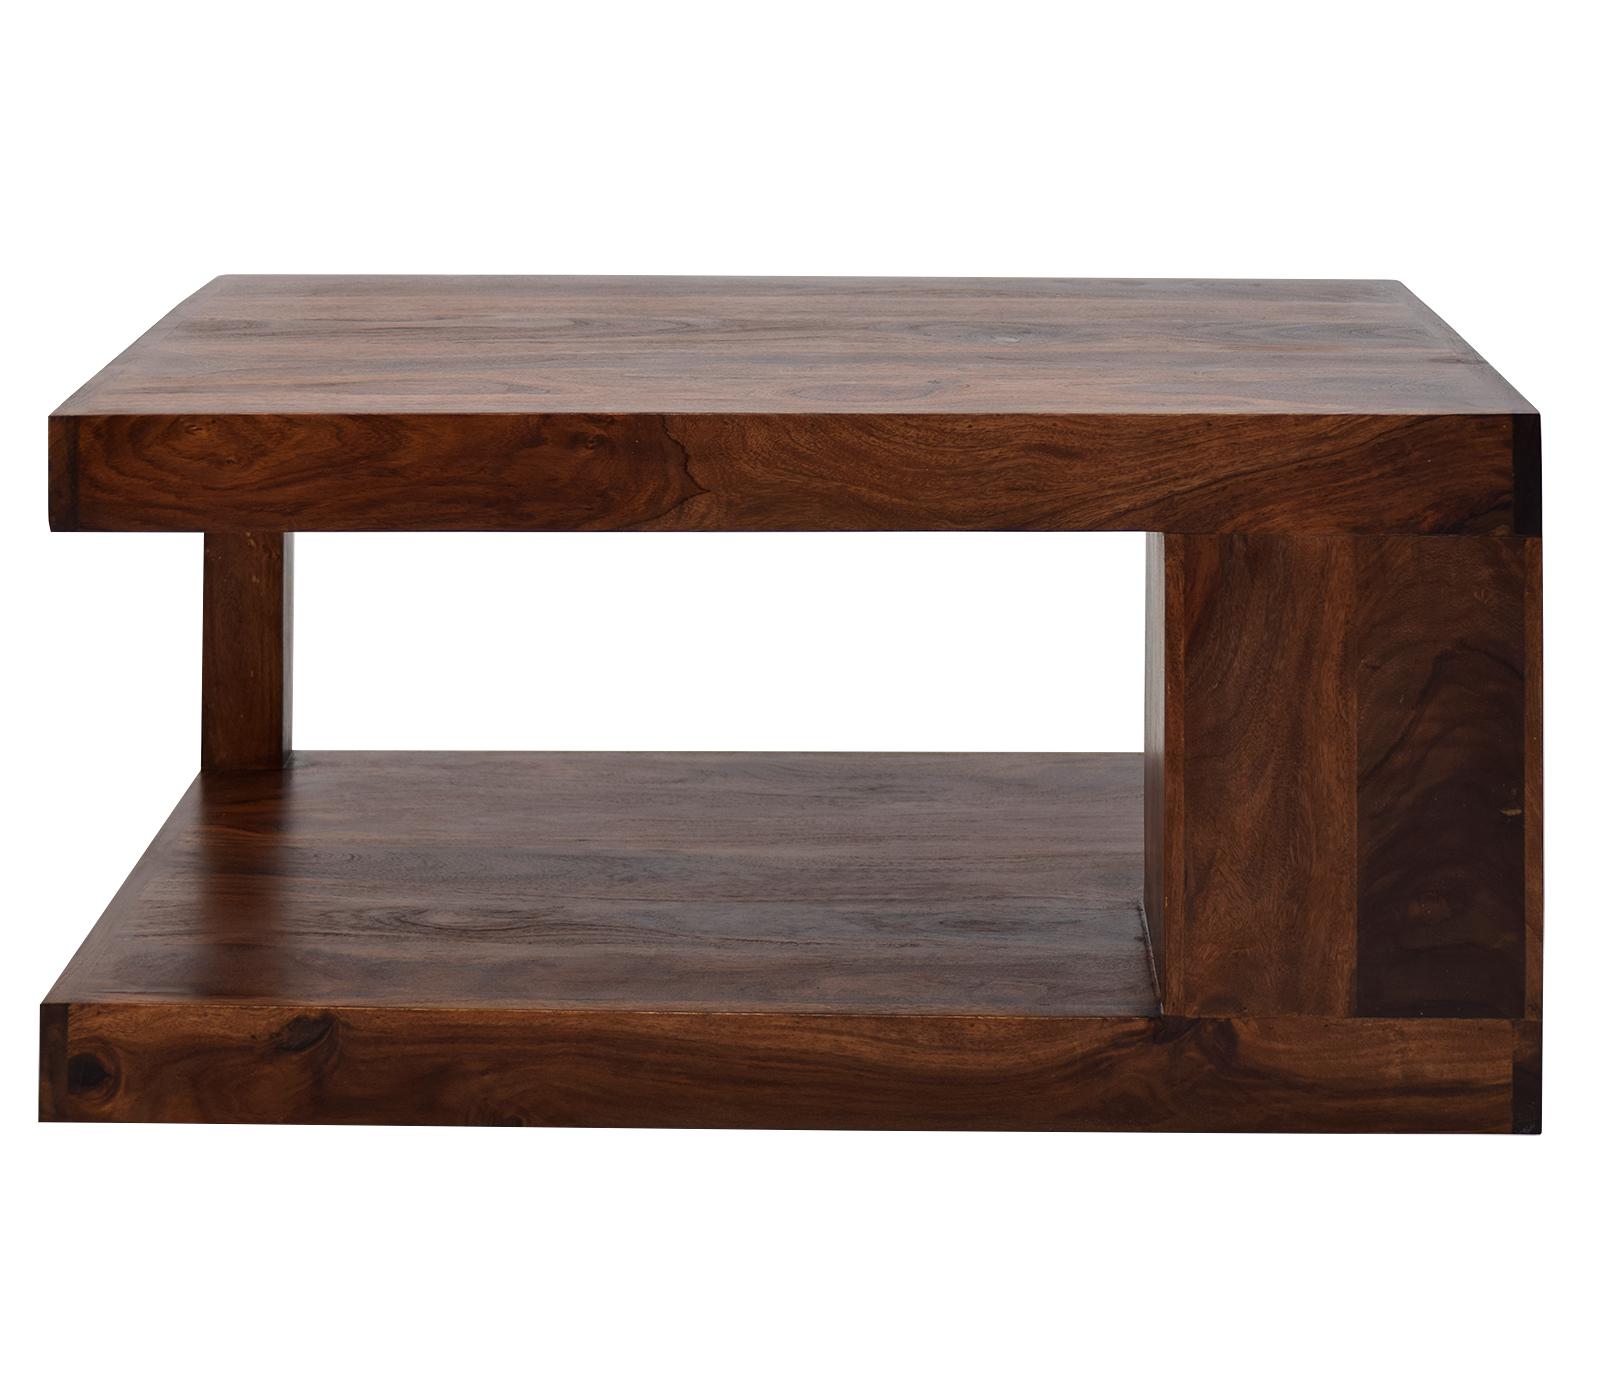 couchtisch massiv sheesham jupiter 90 x 60 cm. Black Bedroom Furniture Sets. Home Design Ideas